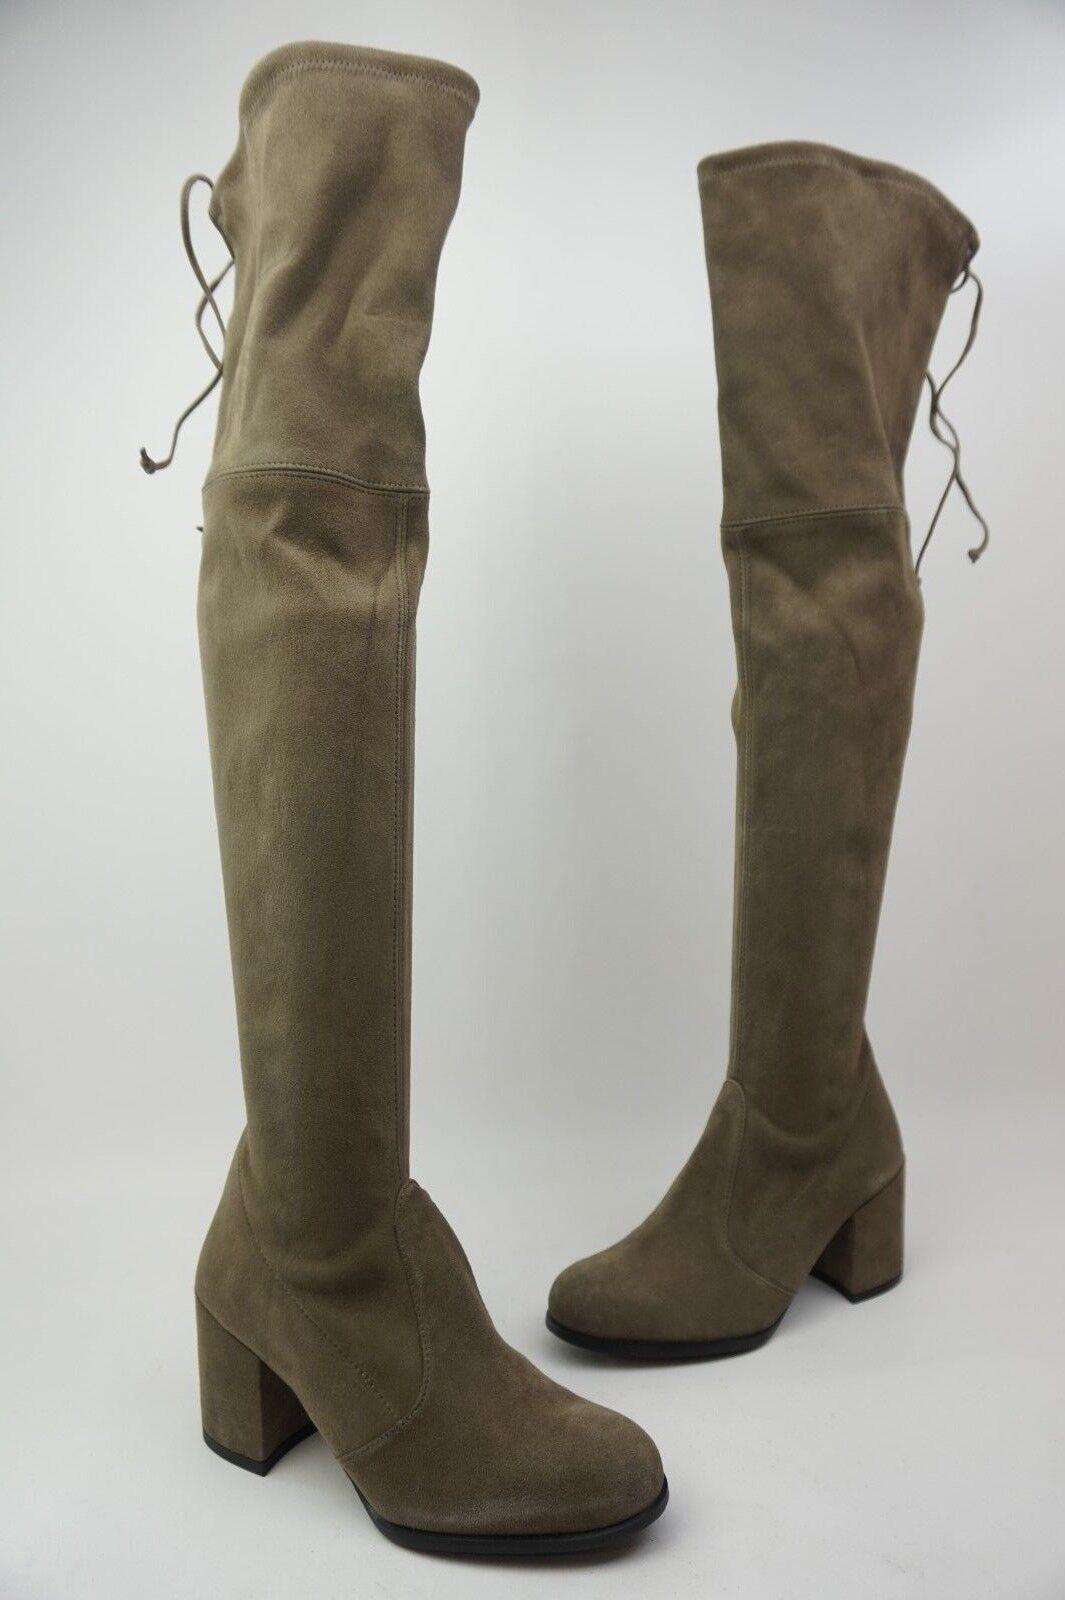 Stuart Weitzman Hinterland Praline Grey Over The Knee Boots Boots Boots Size 5 M b35469